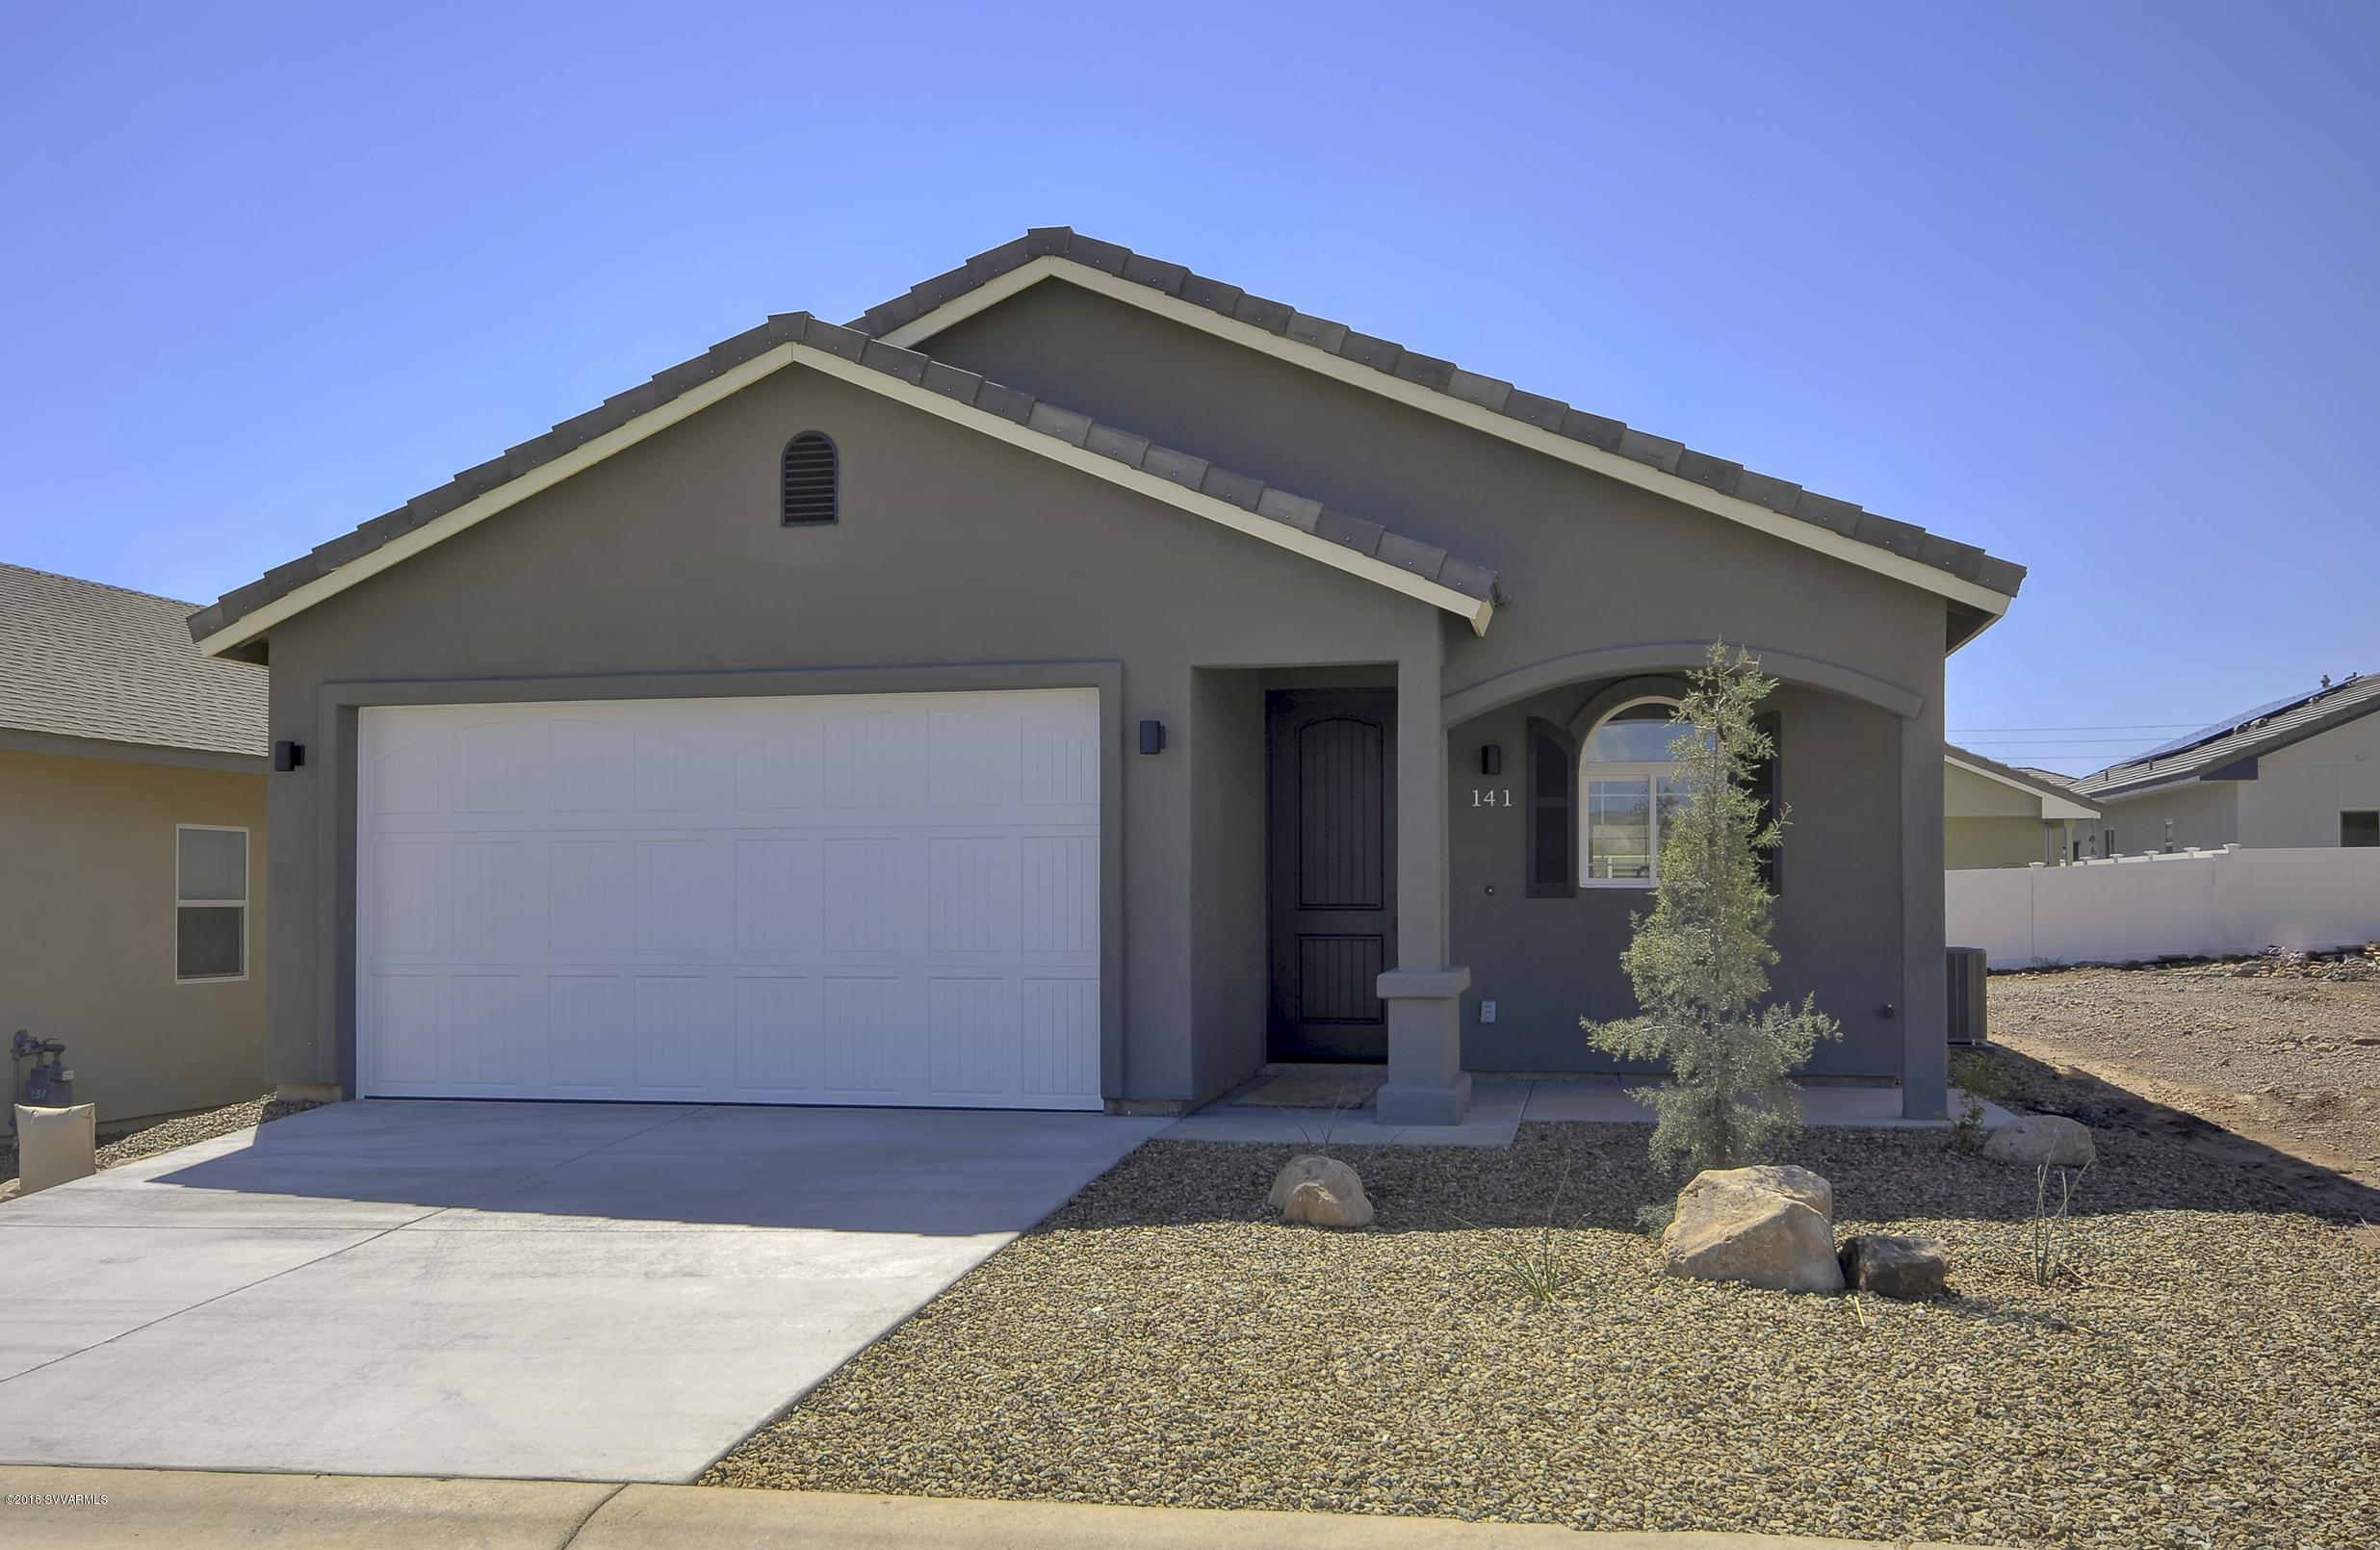 141 Granite Springs Rd Clarkdale, AZ 86324